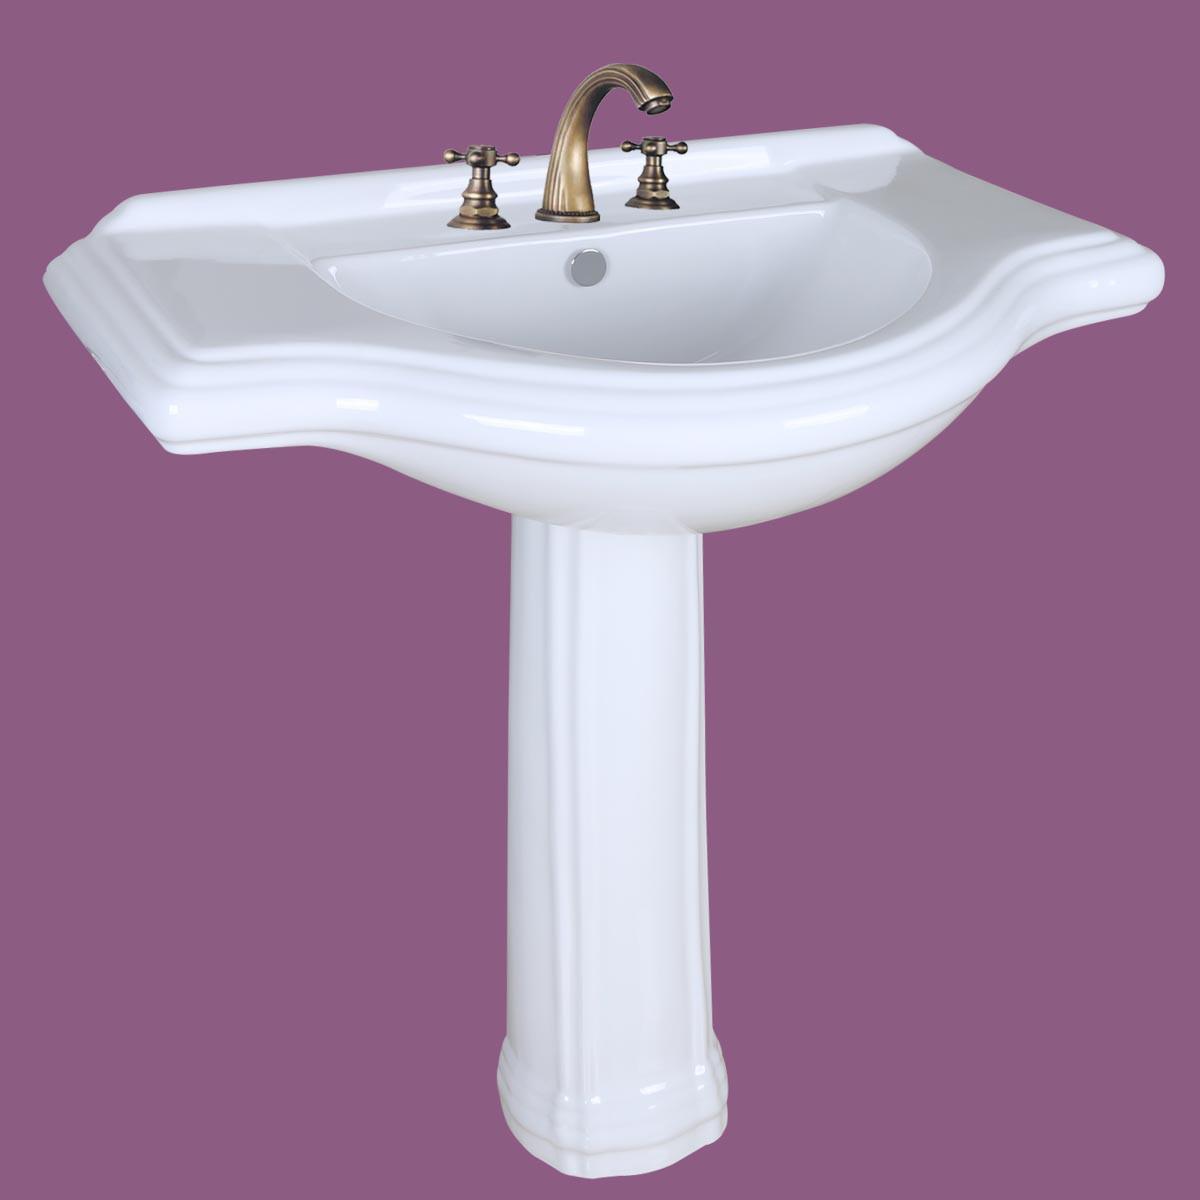 large pedestal sink bathroom console 8 widespread 34 w